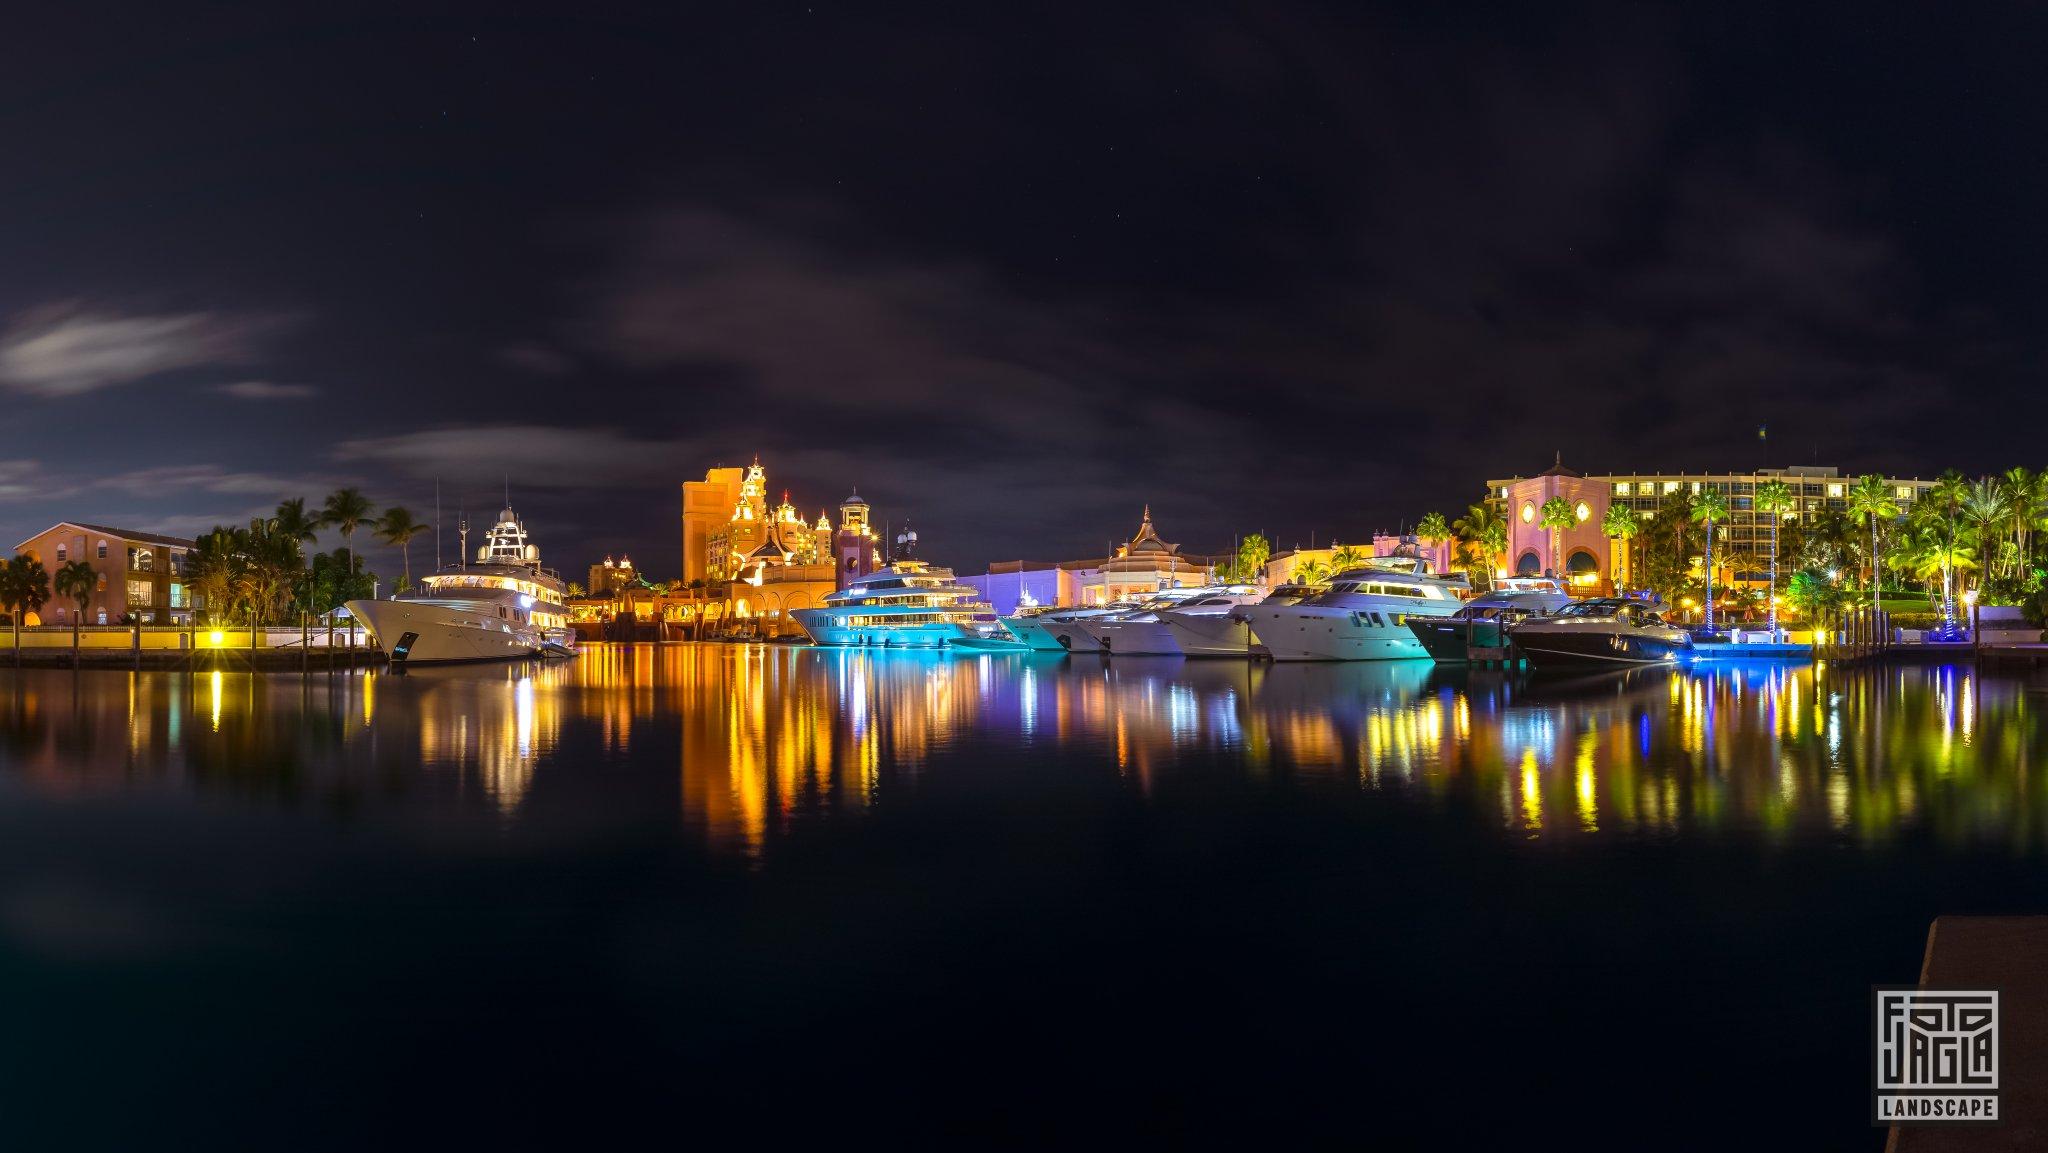 Hafen vom Atlantis Paradise Island Resort Bahamas, Paradise Island Nachtaufnahme mit Langzeitbelichtung